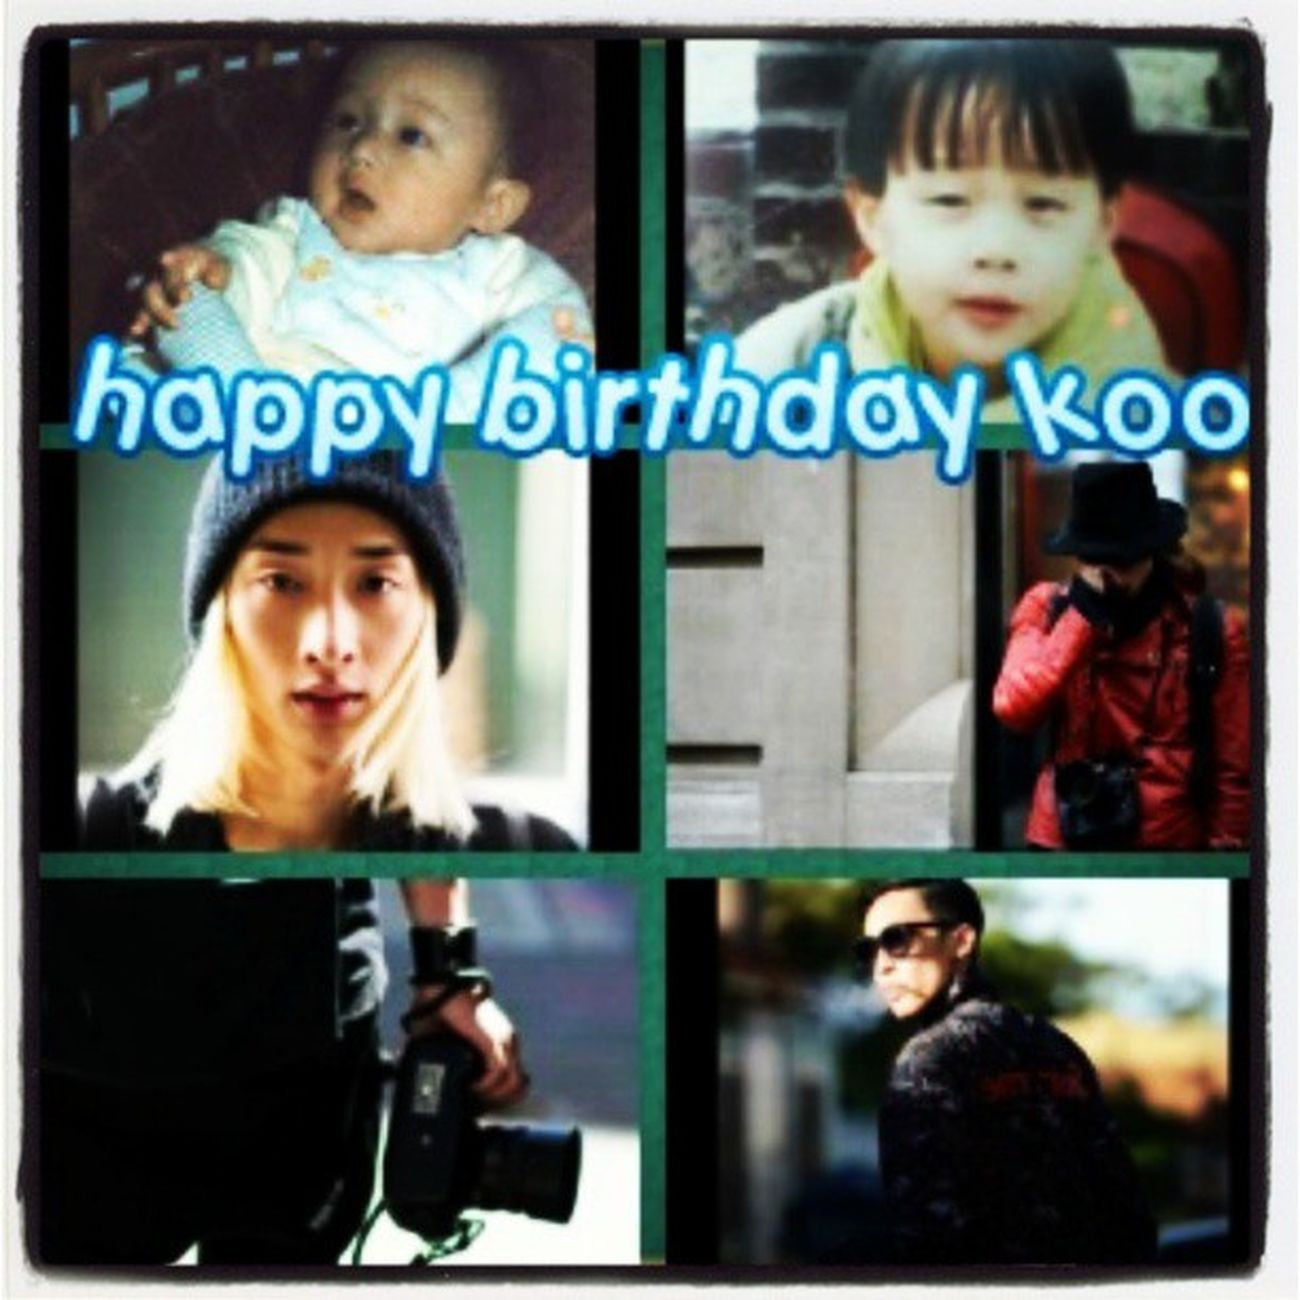 @youngjunkoo happy birthday Koo :) Wishing u all the best and may u create all the things u wanna do!!!HappyBirthday Koo I 'MKOOLWish tagsforlikesTFLersthzfortagsigersseptember42013